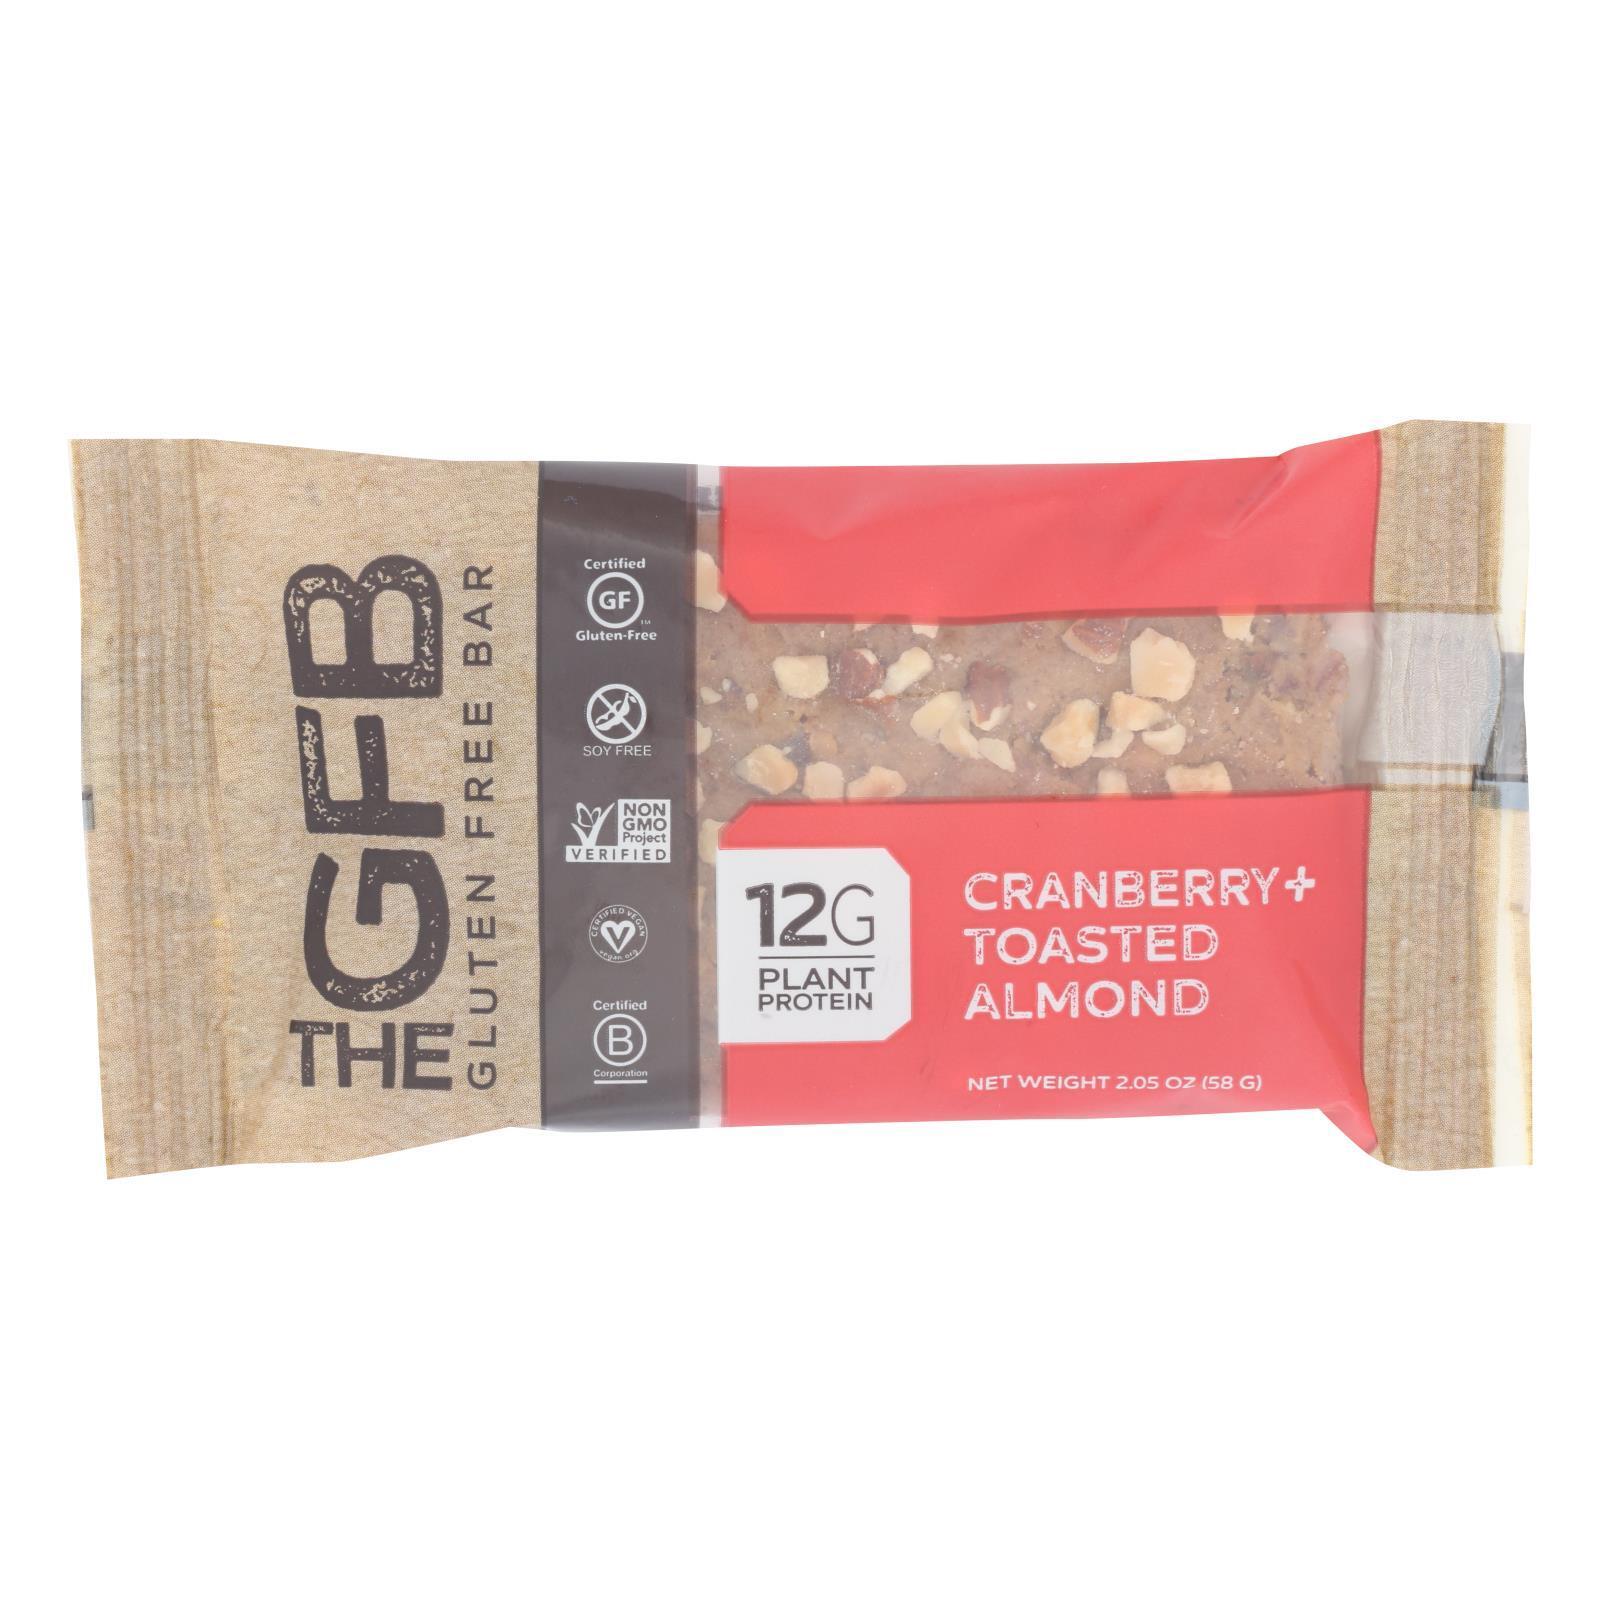 The Gluten Freeb Bar - Cranberry Toasted Almond - Gluten Free - Case of 12 - 2.05 oz